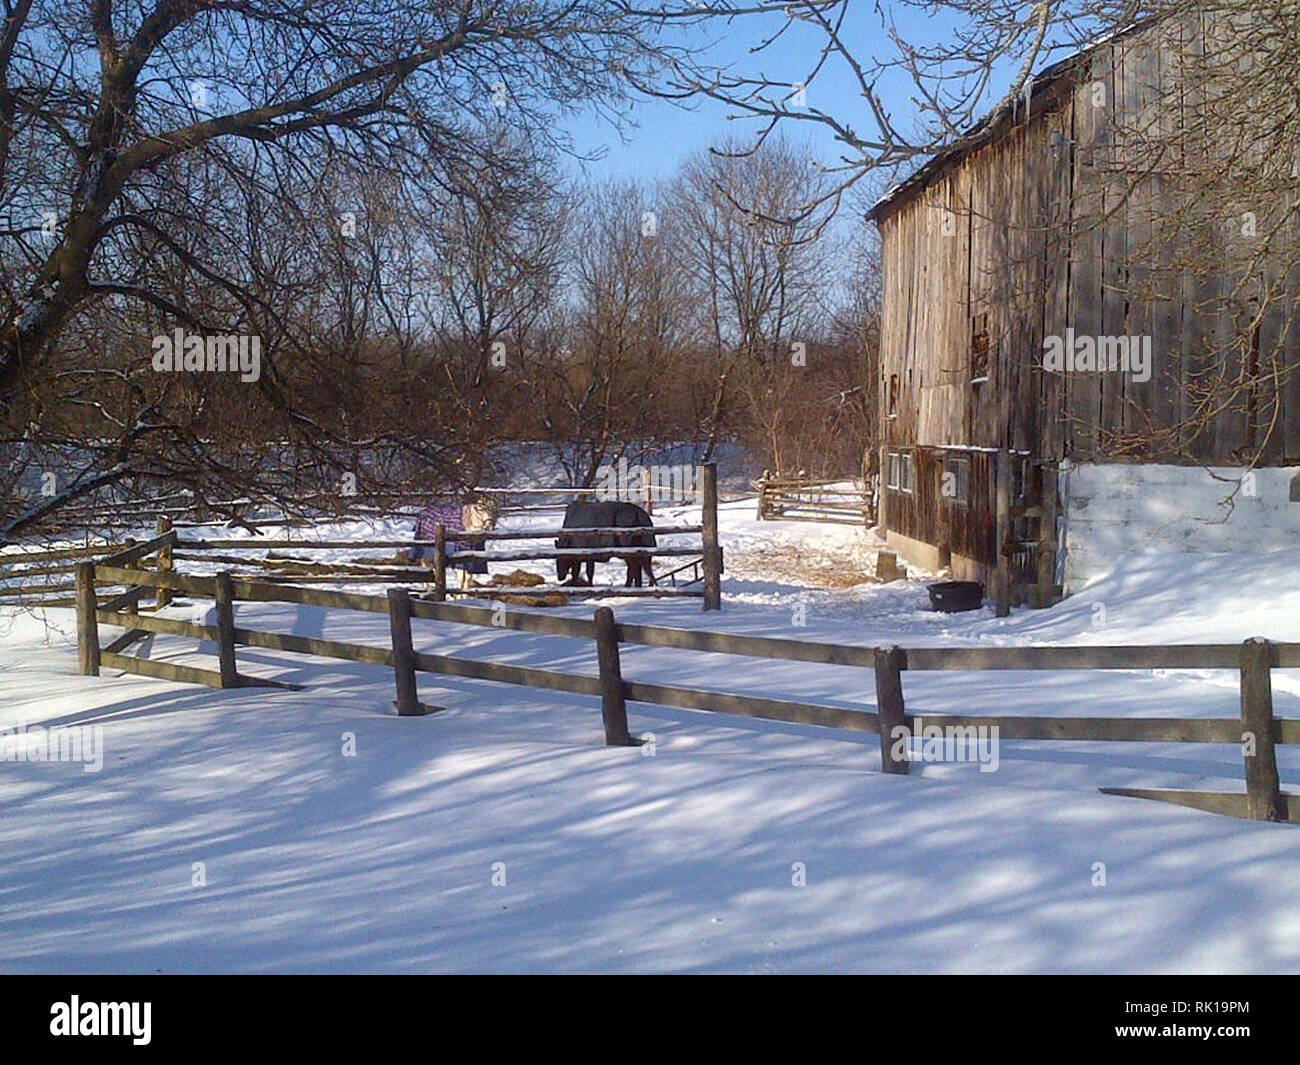 Two horses eating in winter barnyard - Stock Image